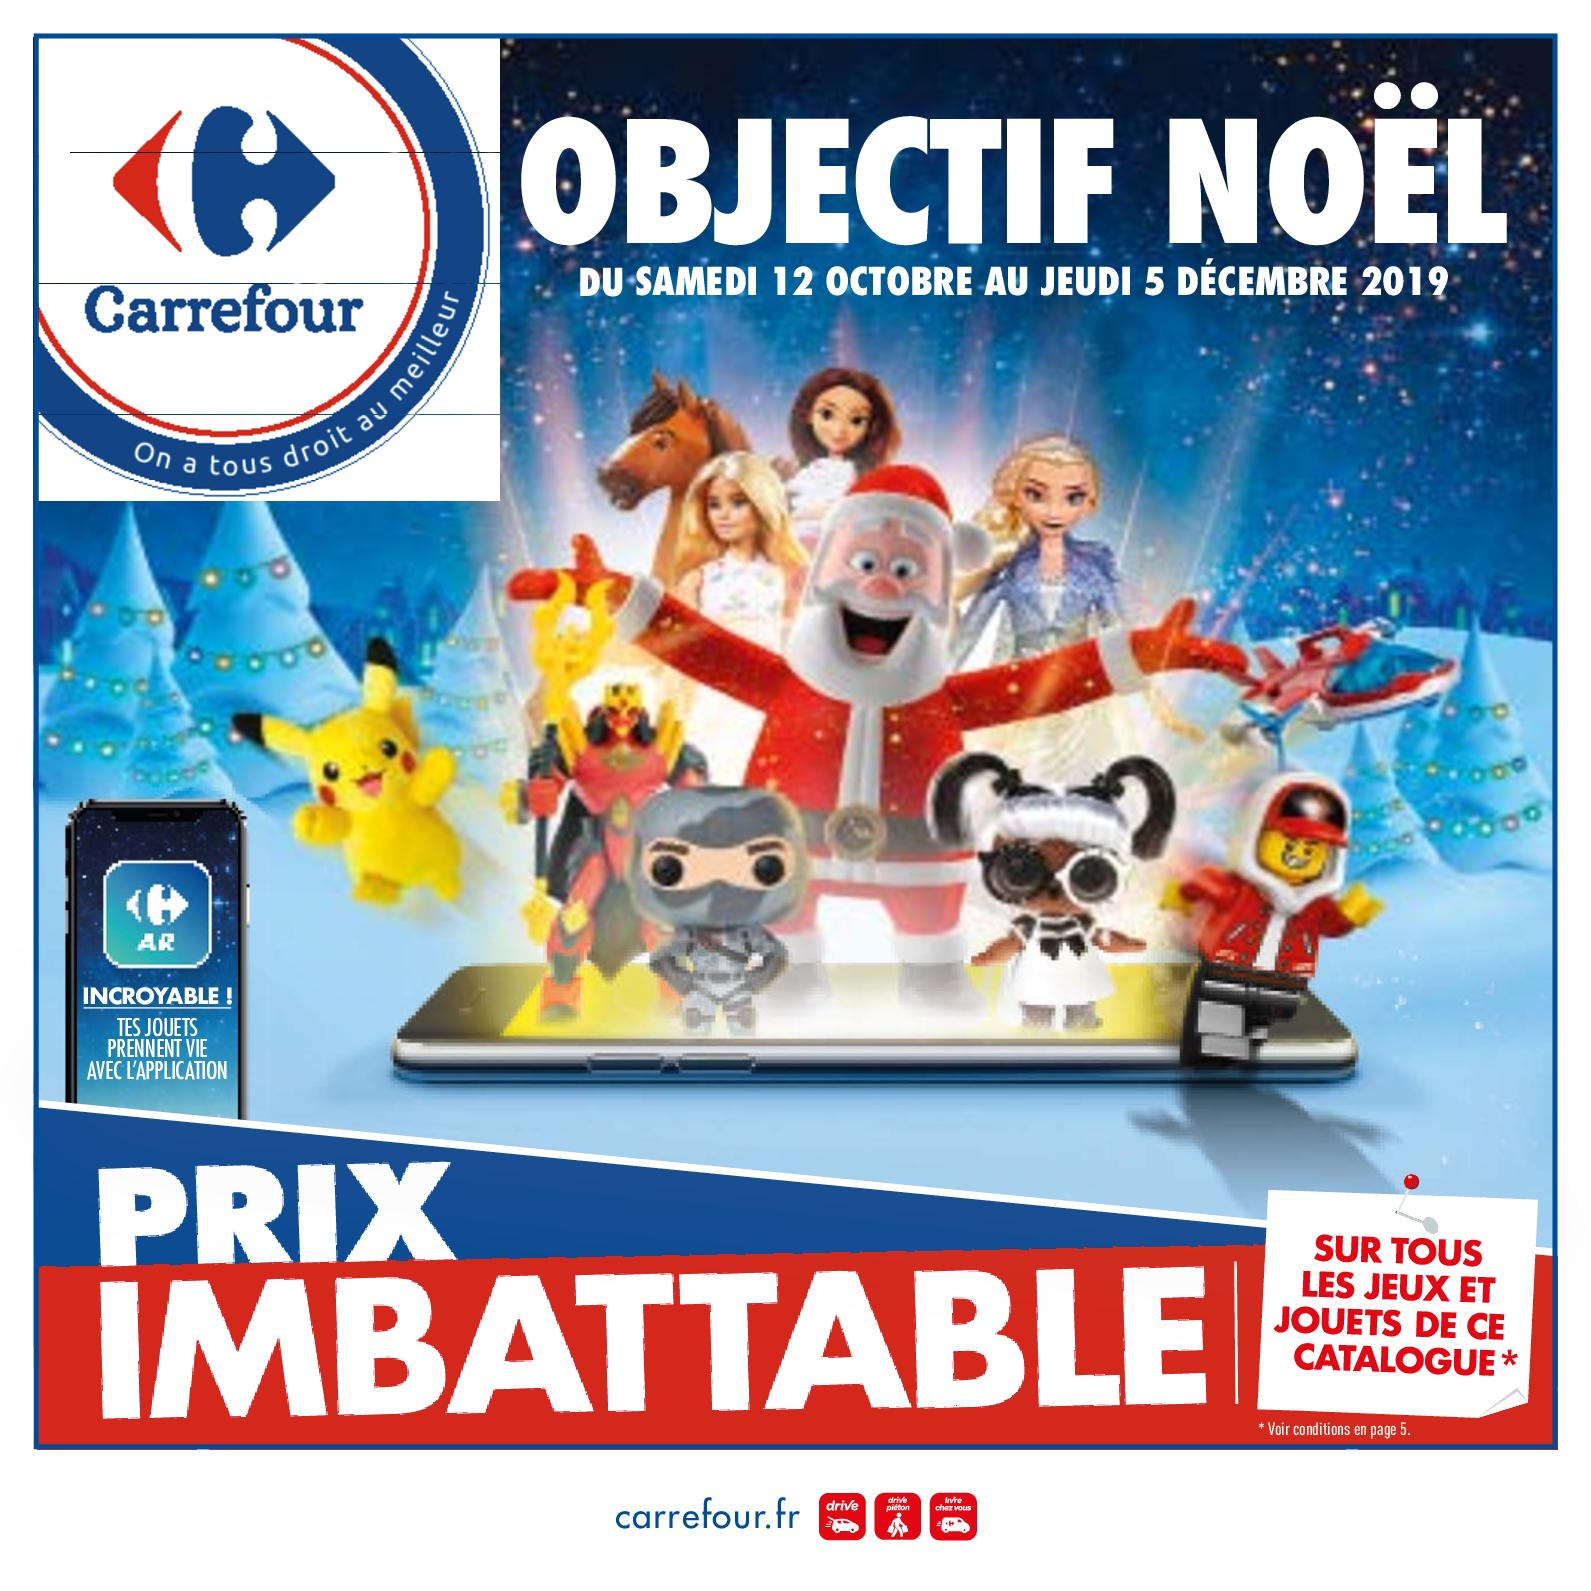 Calendrier De L Avent Lego Star Wars Carrefour.Calameo Catalogue Jouets Hypermarches Carrefour